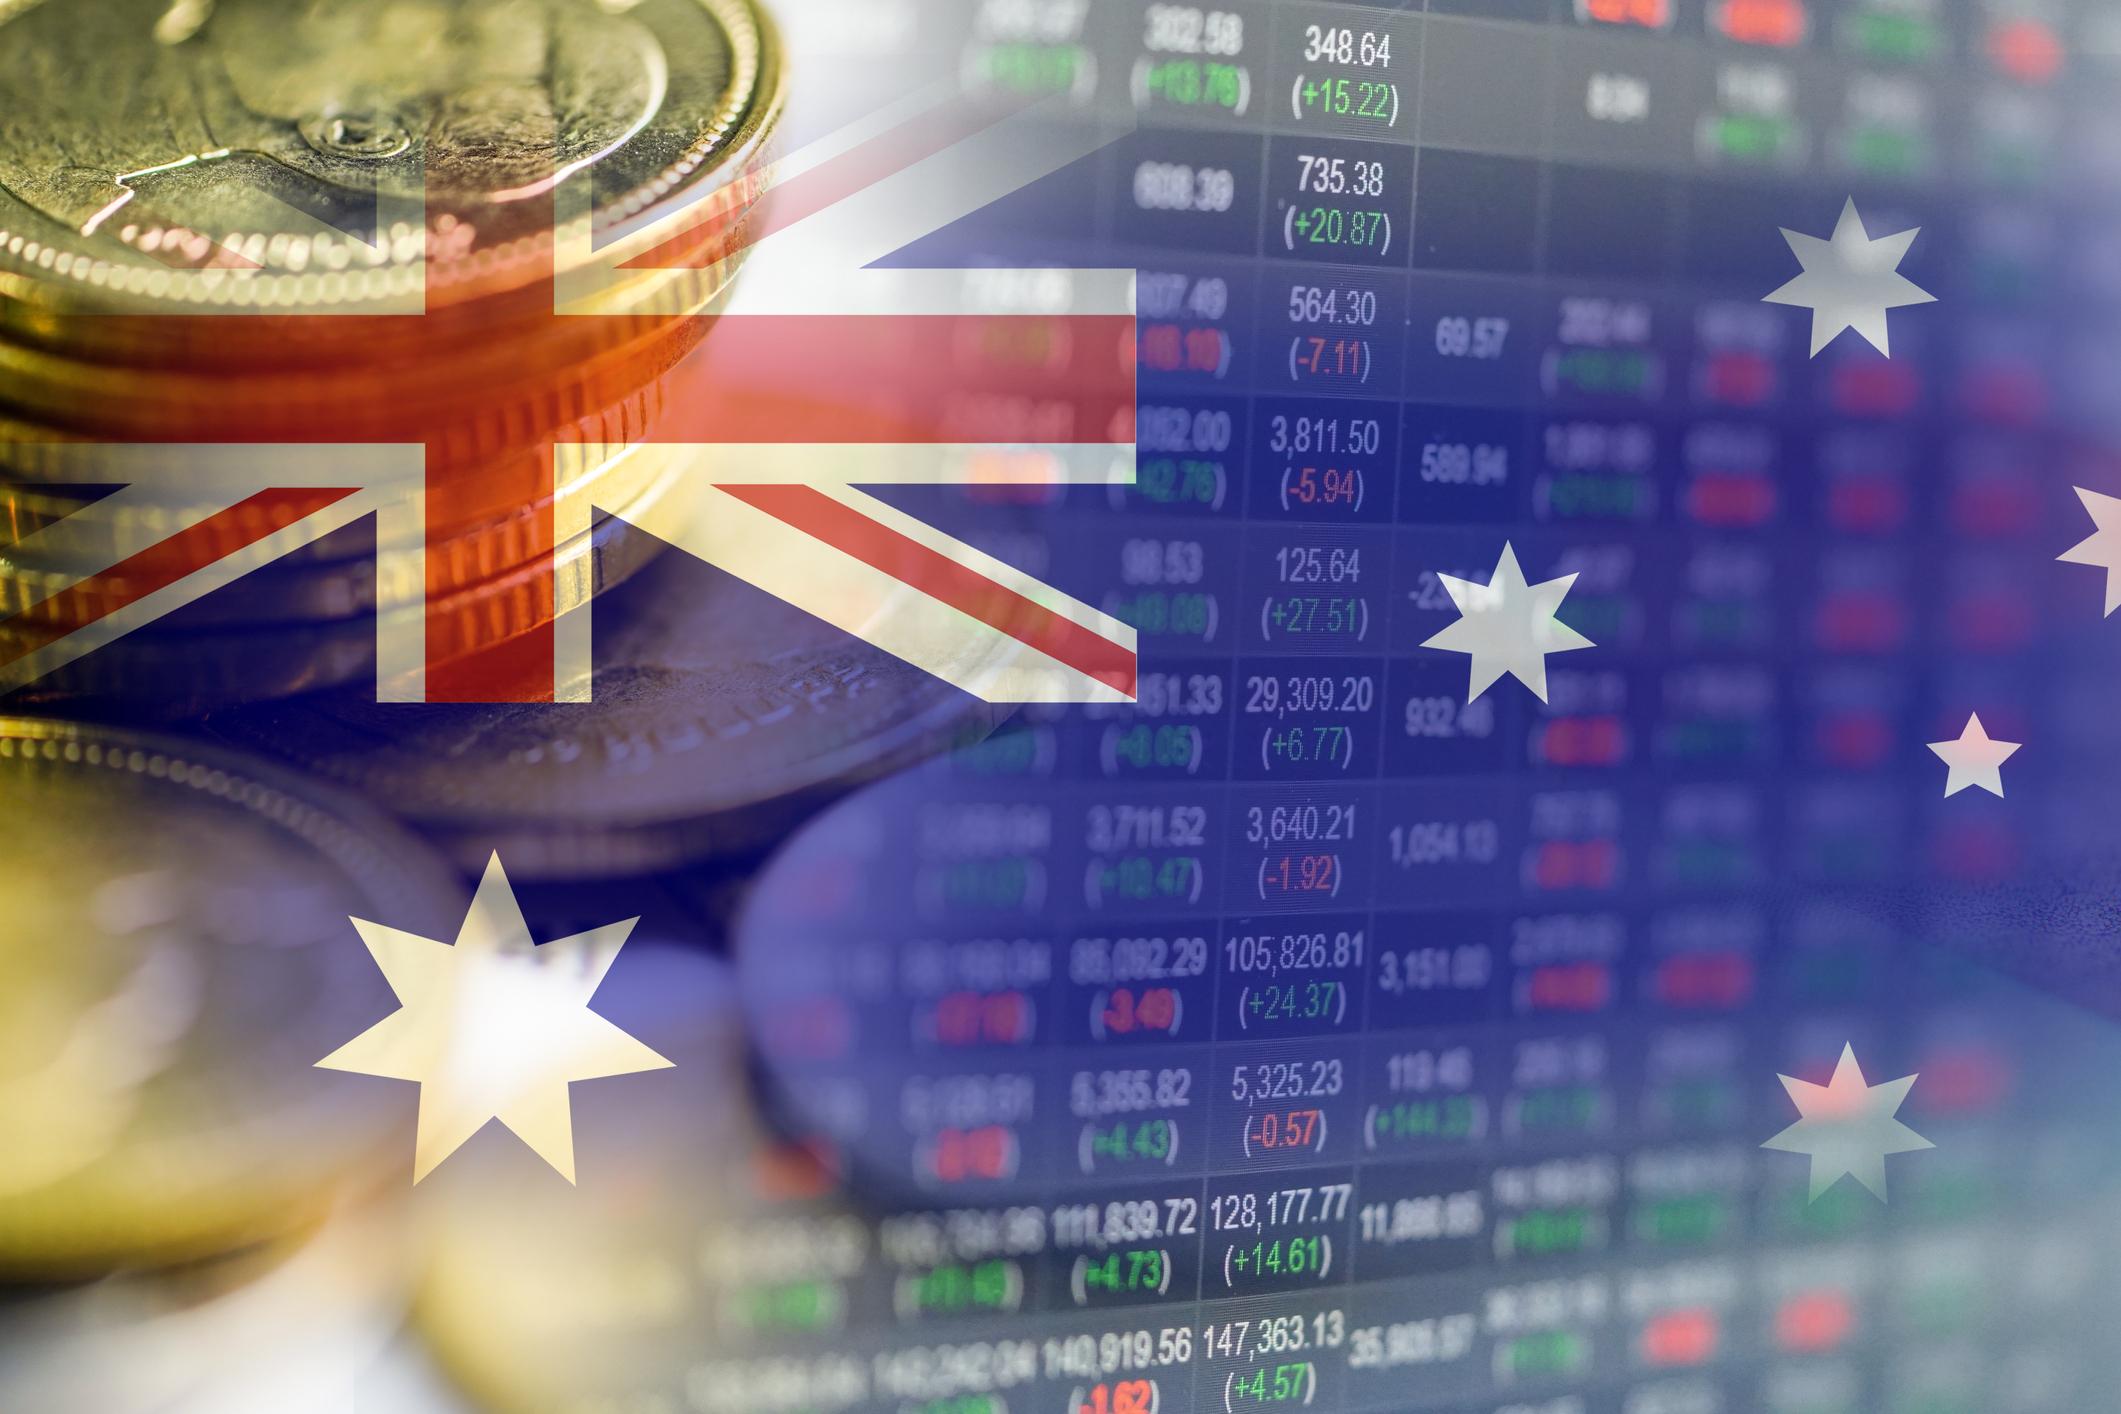 Qantas, Webjet & Flight Centre among travel companies hardest hit by ASX fall